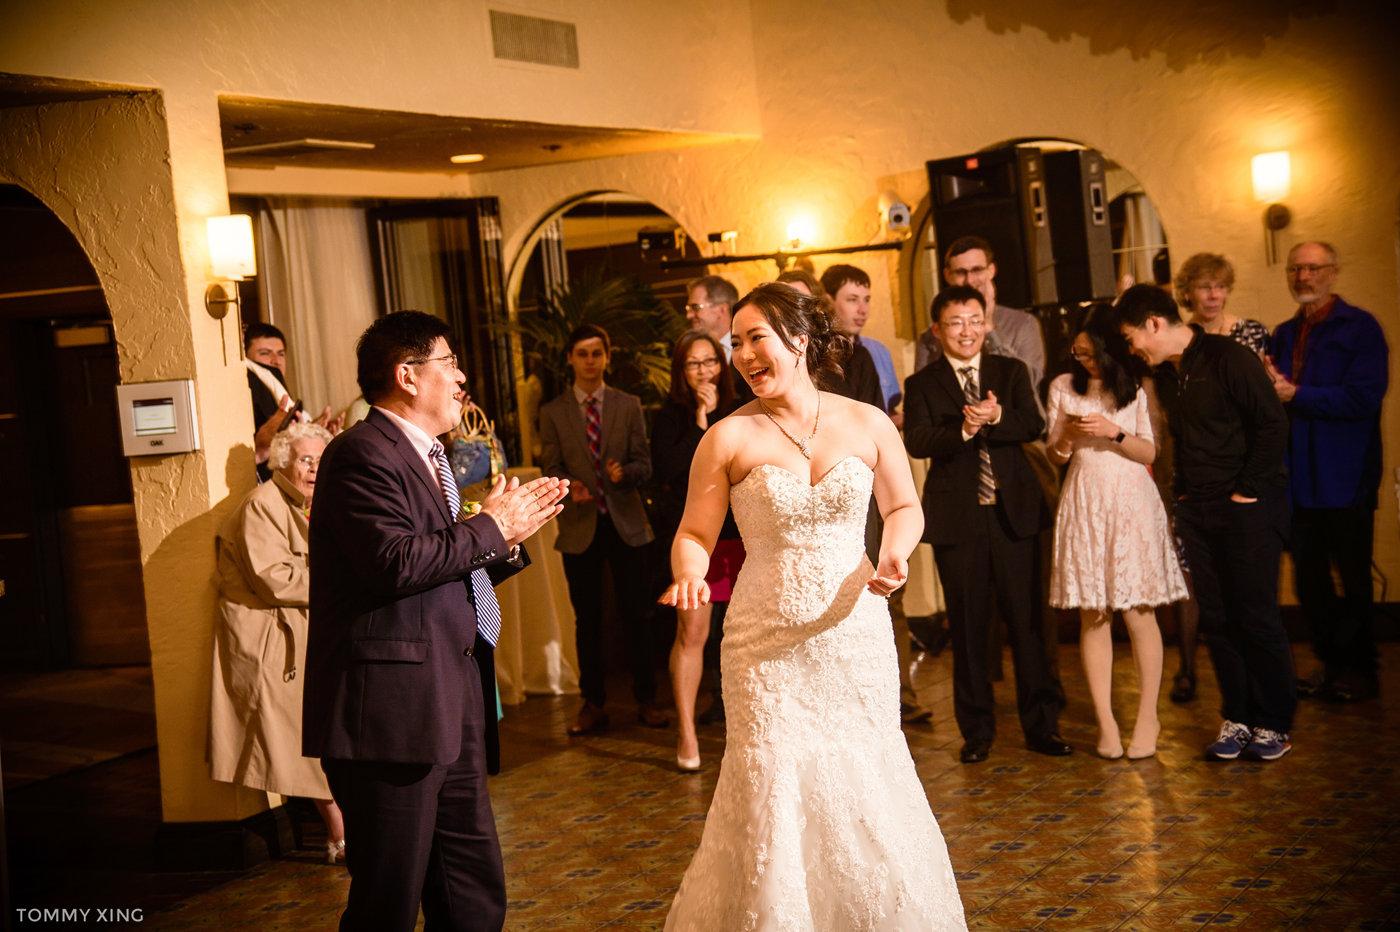 STANFORD MEMORIAL CHURCH WEDDING - Wenjie & Chengcheng - SAN FRANCISCO BAY AREA 斯坦福教堂婚礼跟拍 - 洛杉矶婚礼婚纱照摄影师 Tommy Xing Photography262.jpg